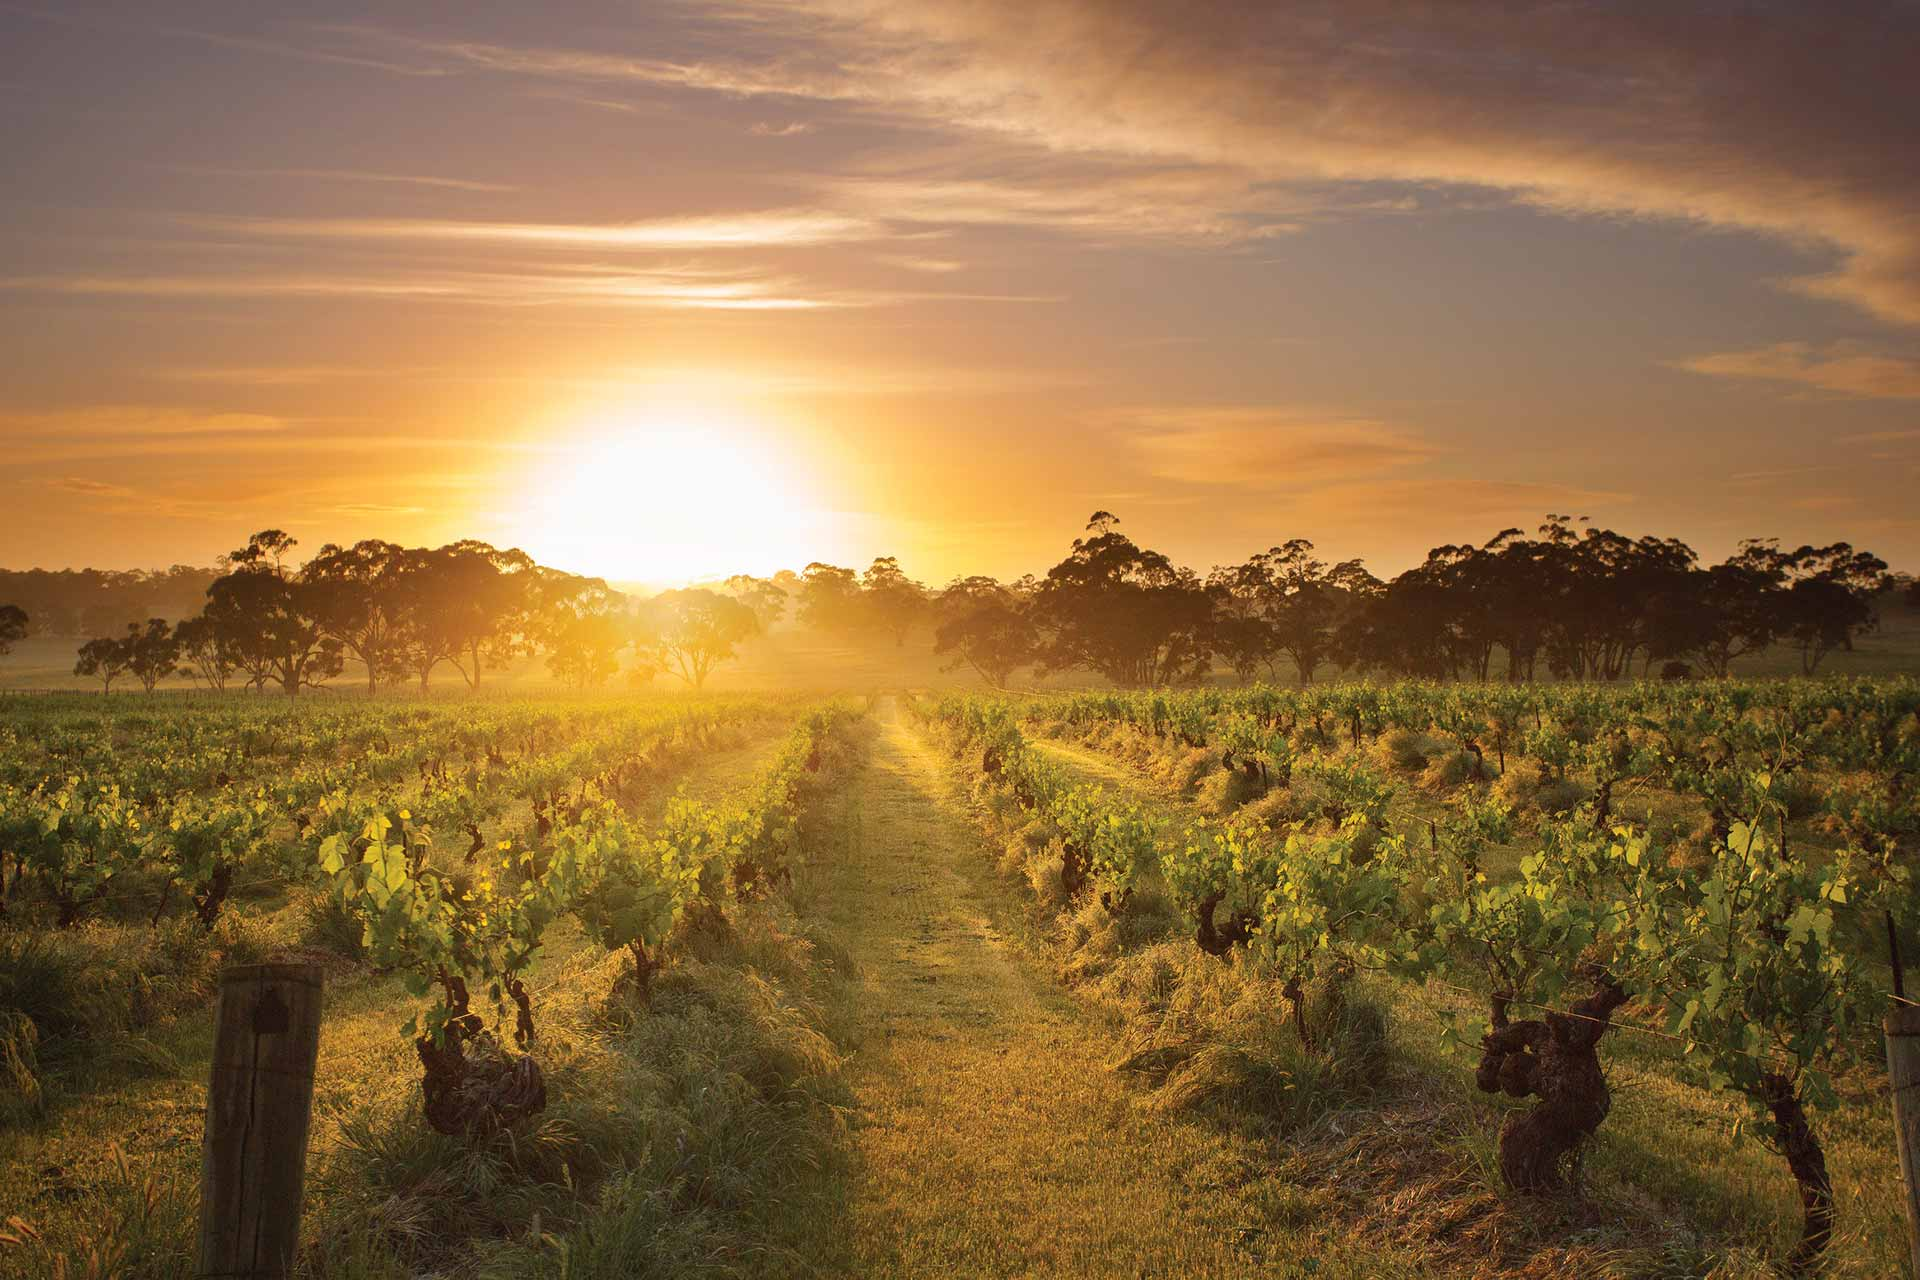 Henschke - Mount Edelstone Vineyard, Barossa Valley, South Australia / Photo: Dragan Radocaj